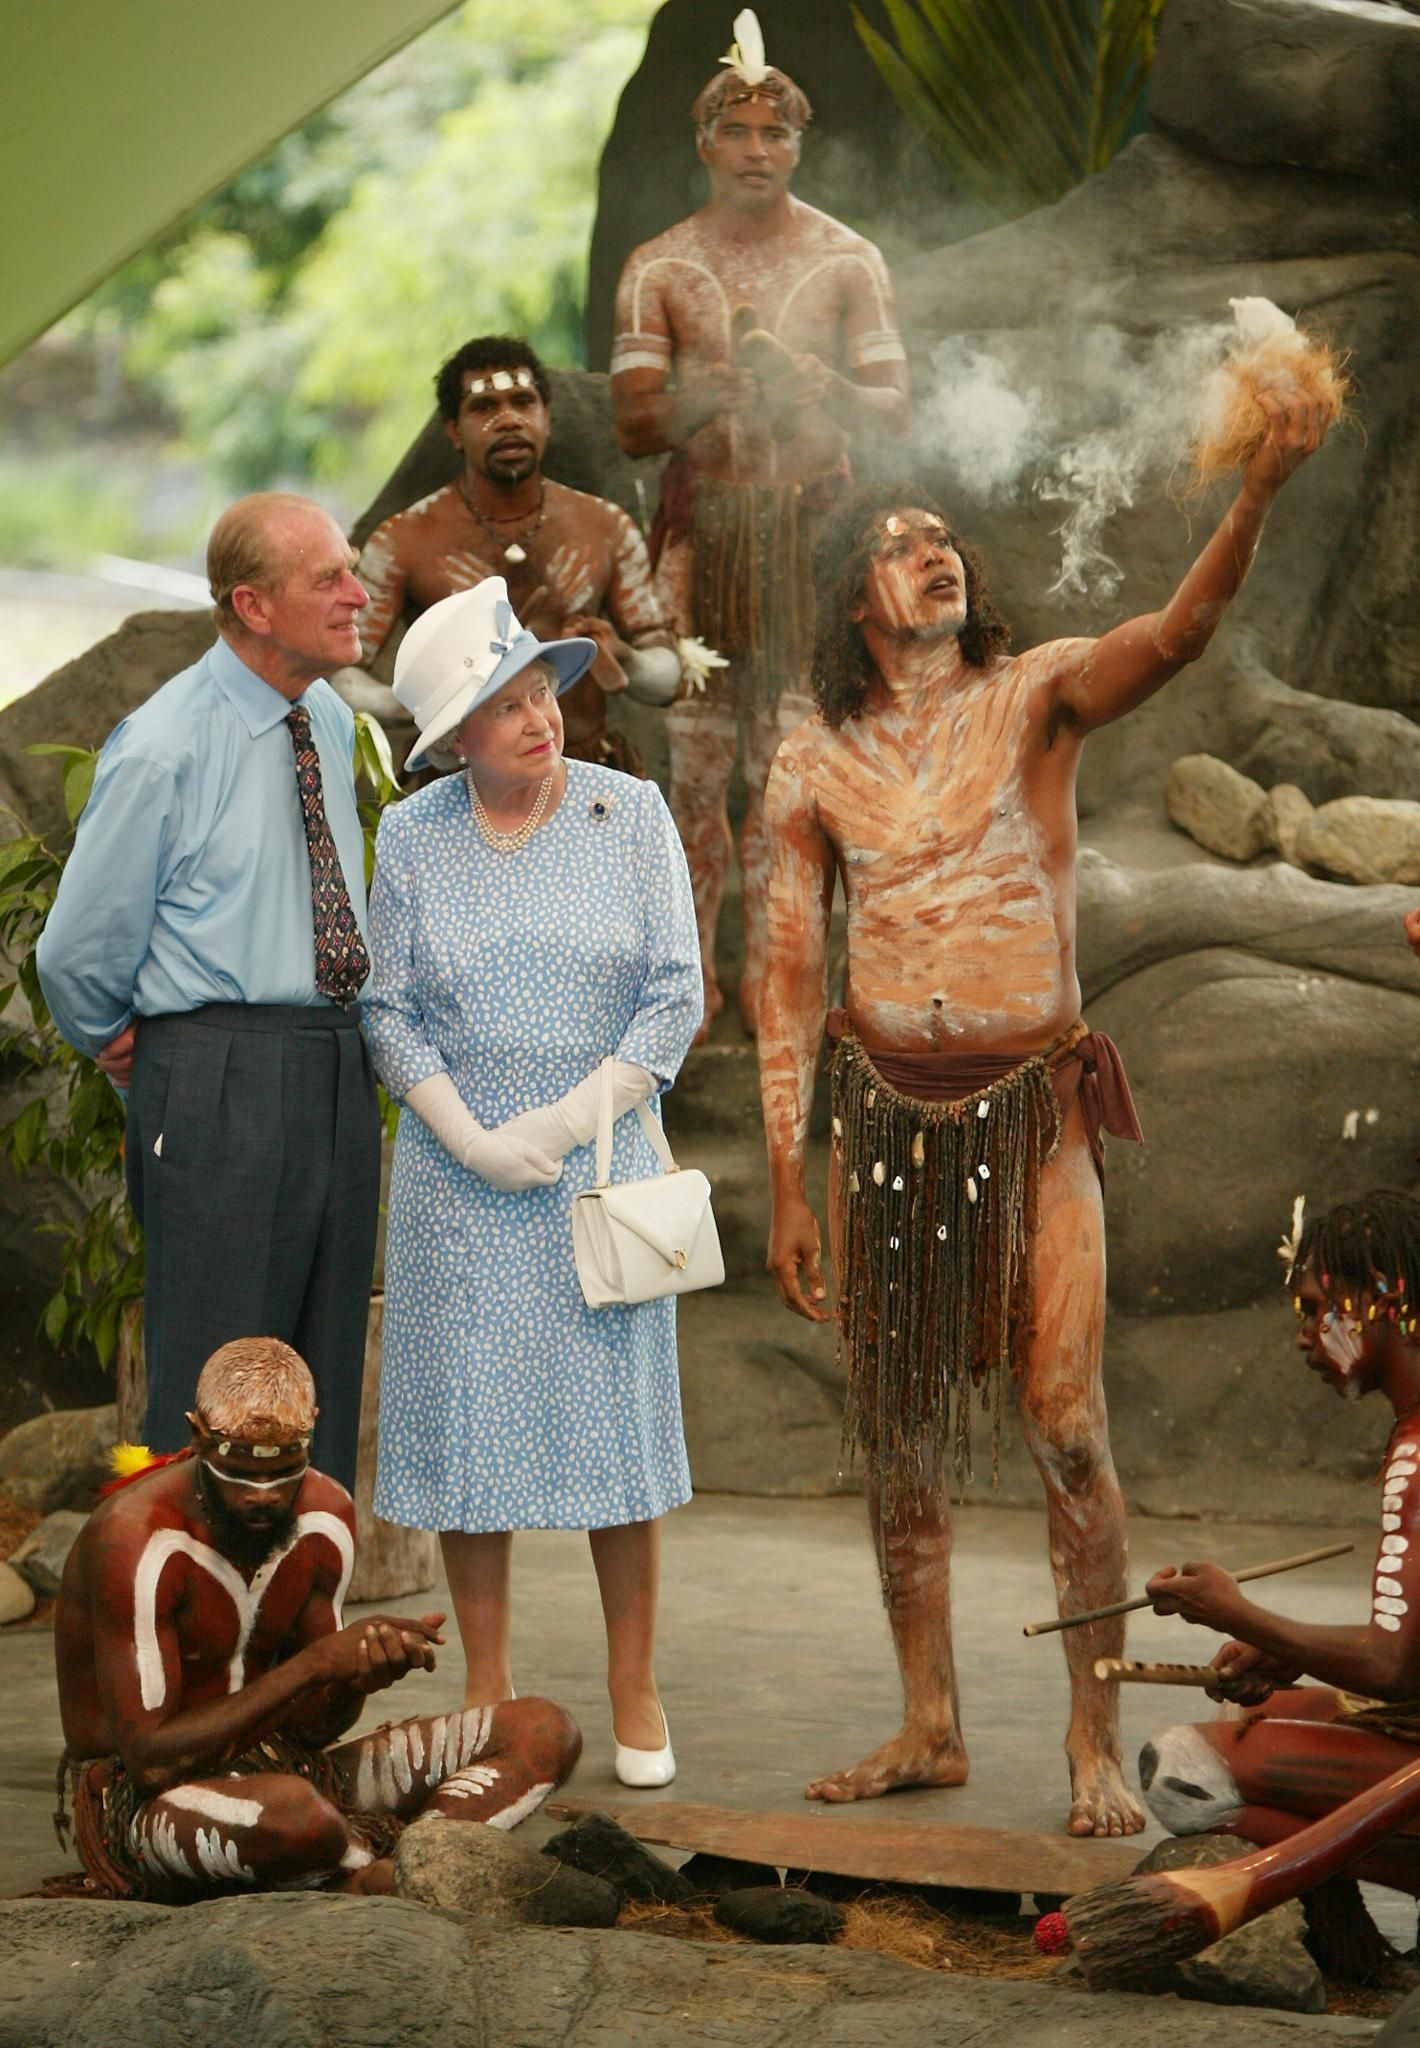 Prinz Philip, die Queen & Aborigines